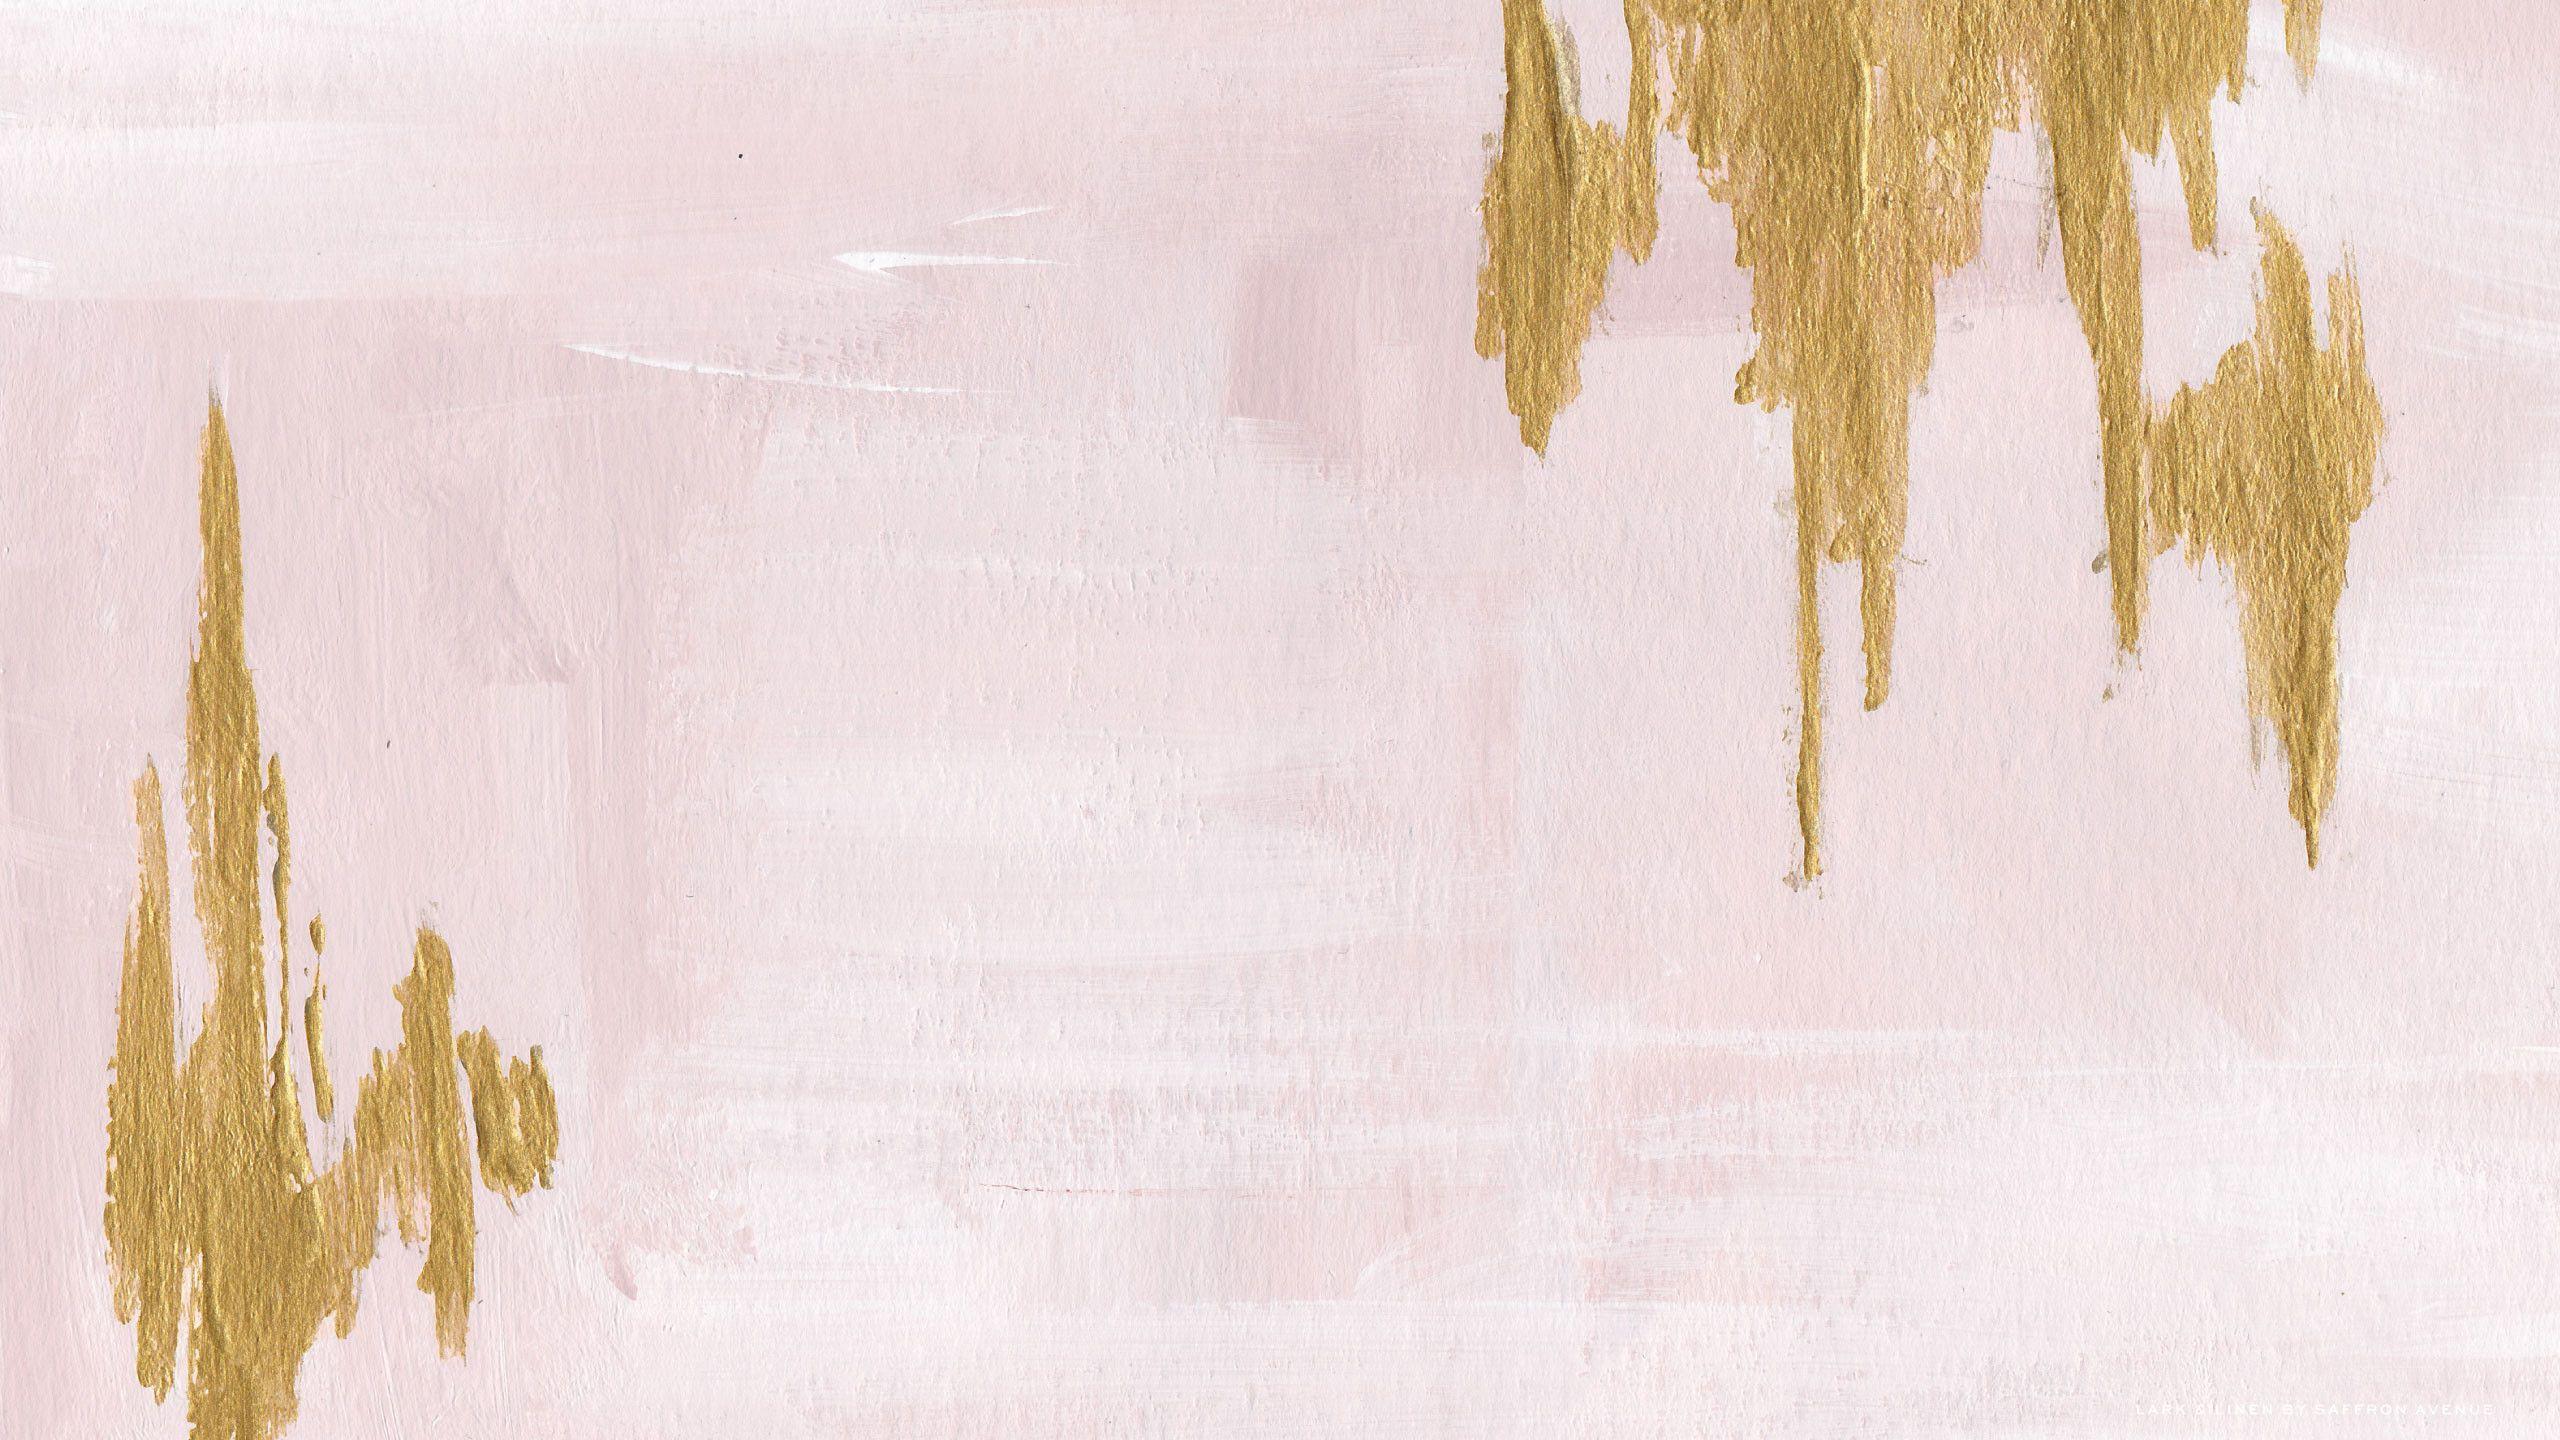 Apotelesma Eikonas Gia Sequin Graphic Rose Gold Wallpaper Floral Wallpaper Desktop Marble Desktop Wallpaper